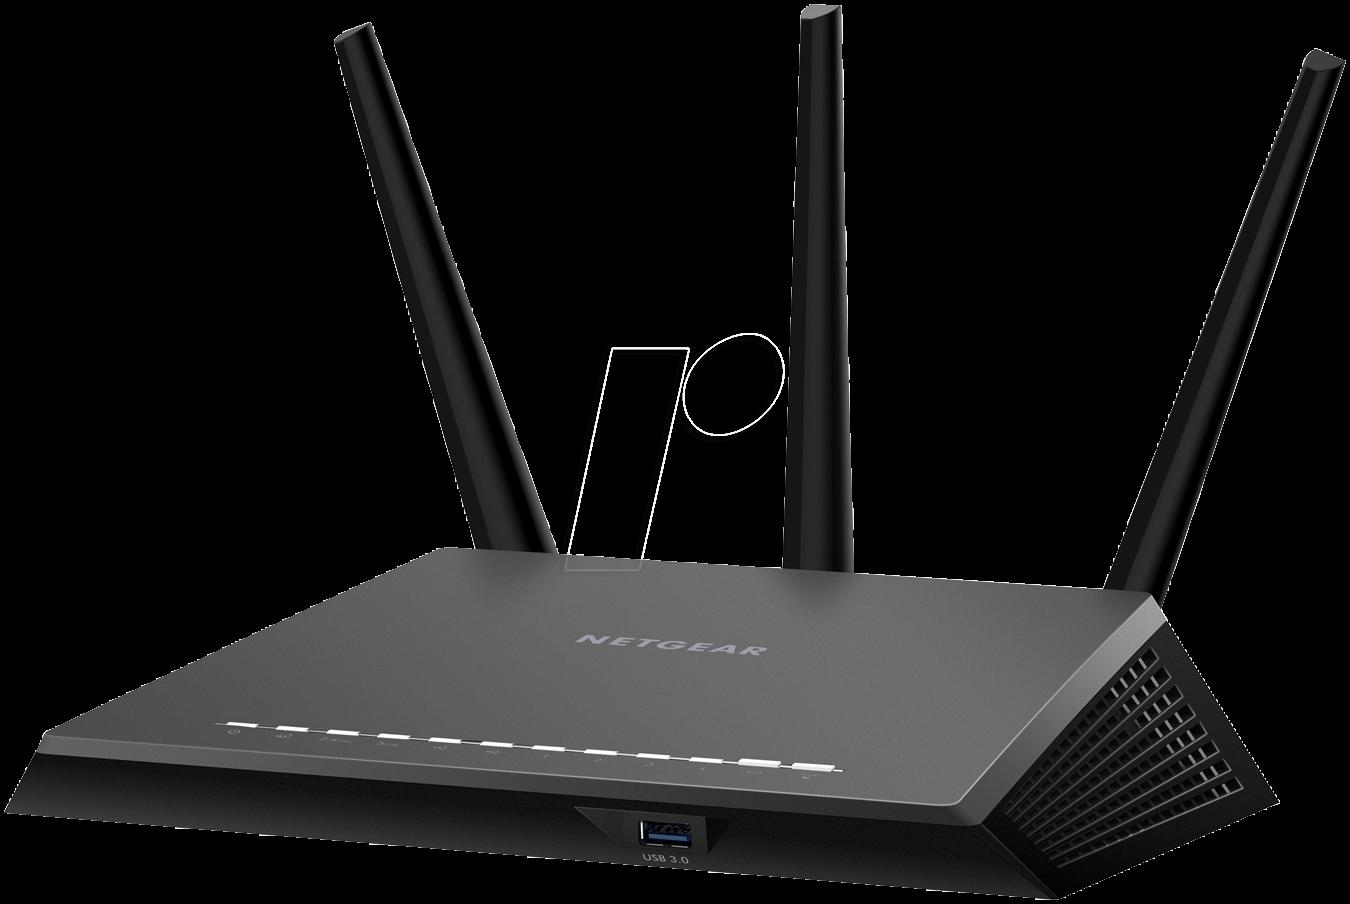 NETGEAR R7000P: R7000P WLAN Router Dual-Band Gigabit at reichelt ...